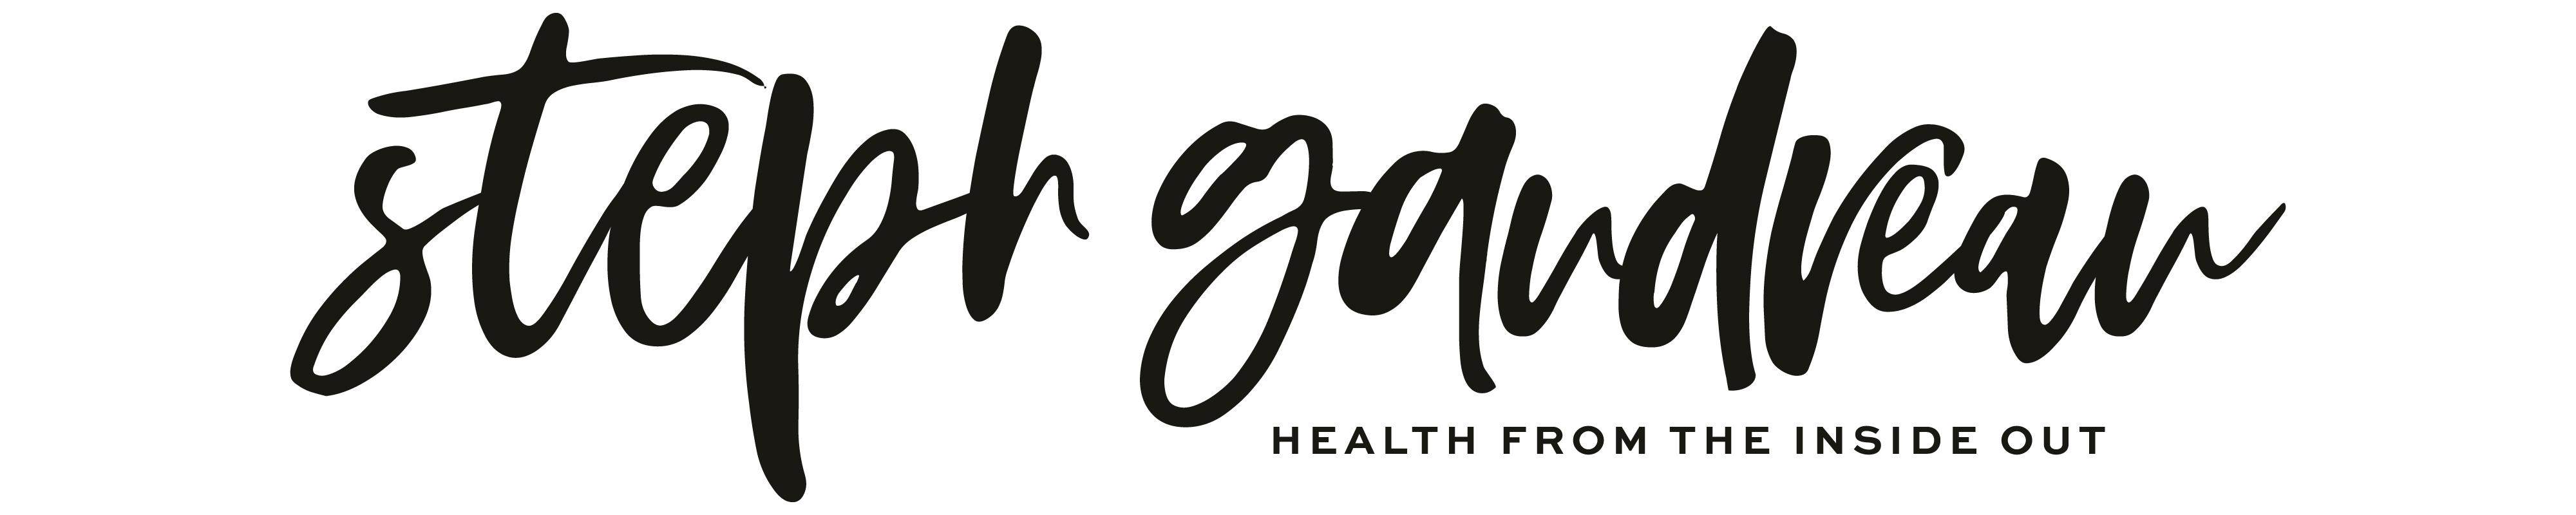 steph gaudreau logo